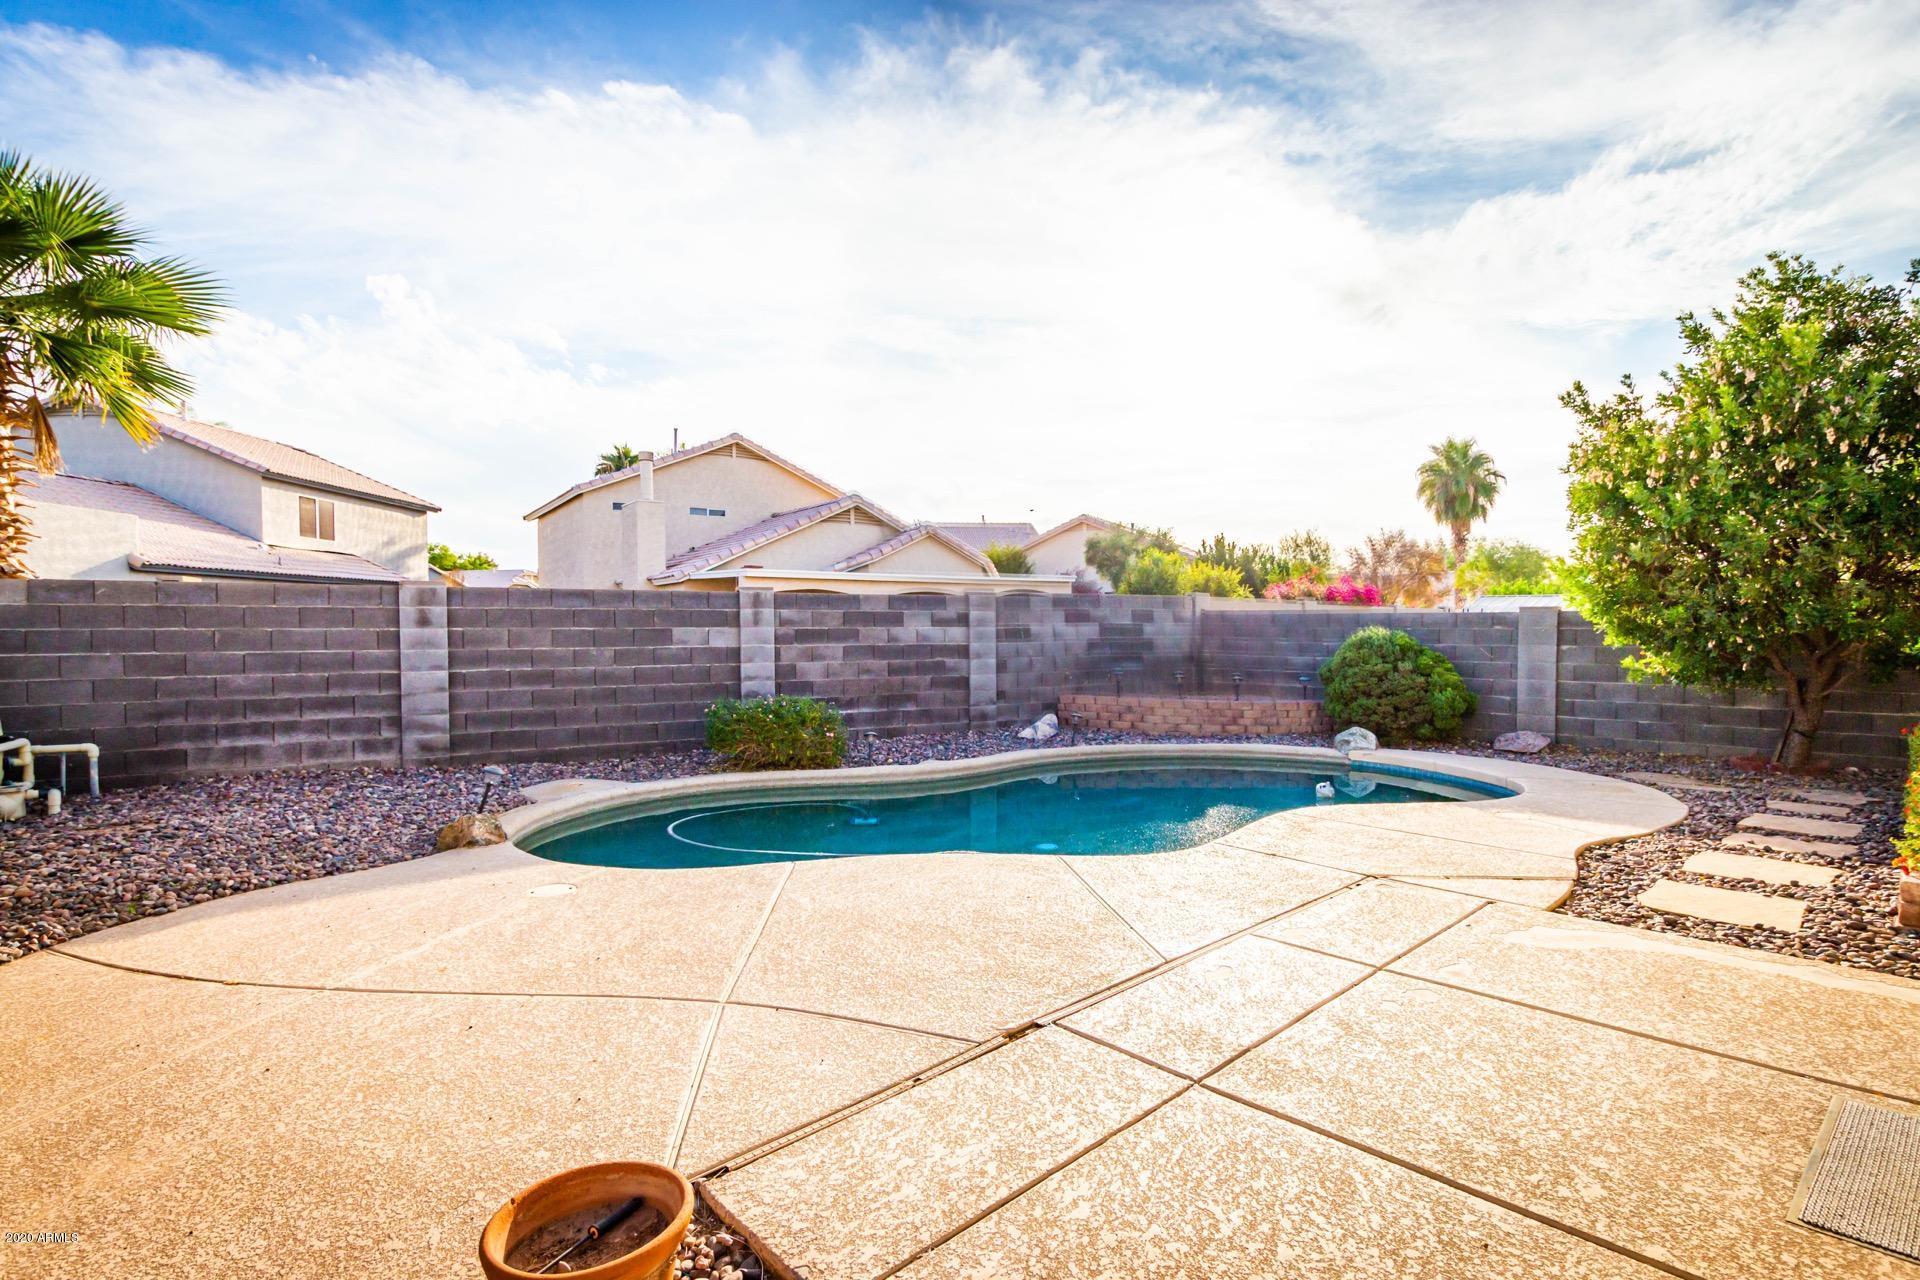 MLS 6156447 921 E FOLLEY Street, Chandler, AZ 85225 Chandler AZ Private Pool